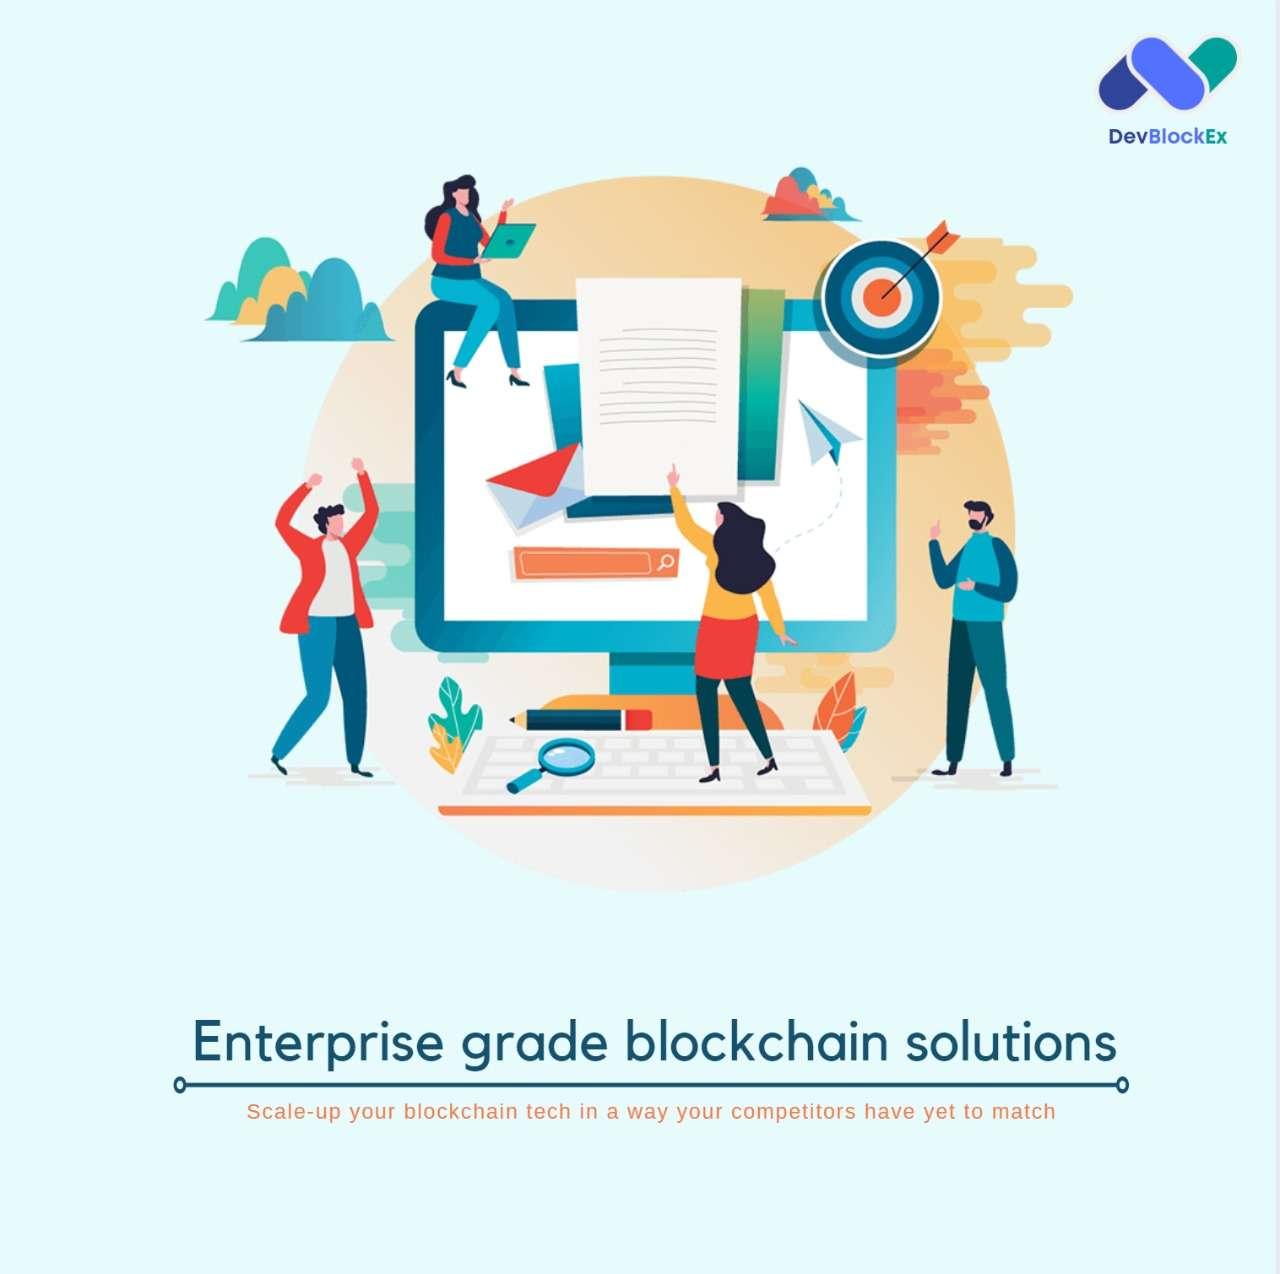 How Big Organizations are Benefitting through DevBlockEx's EnterpriseGrade Blockchain Solutions